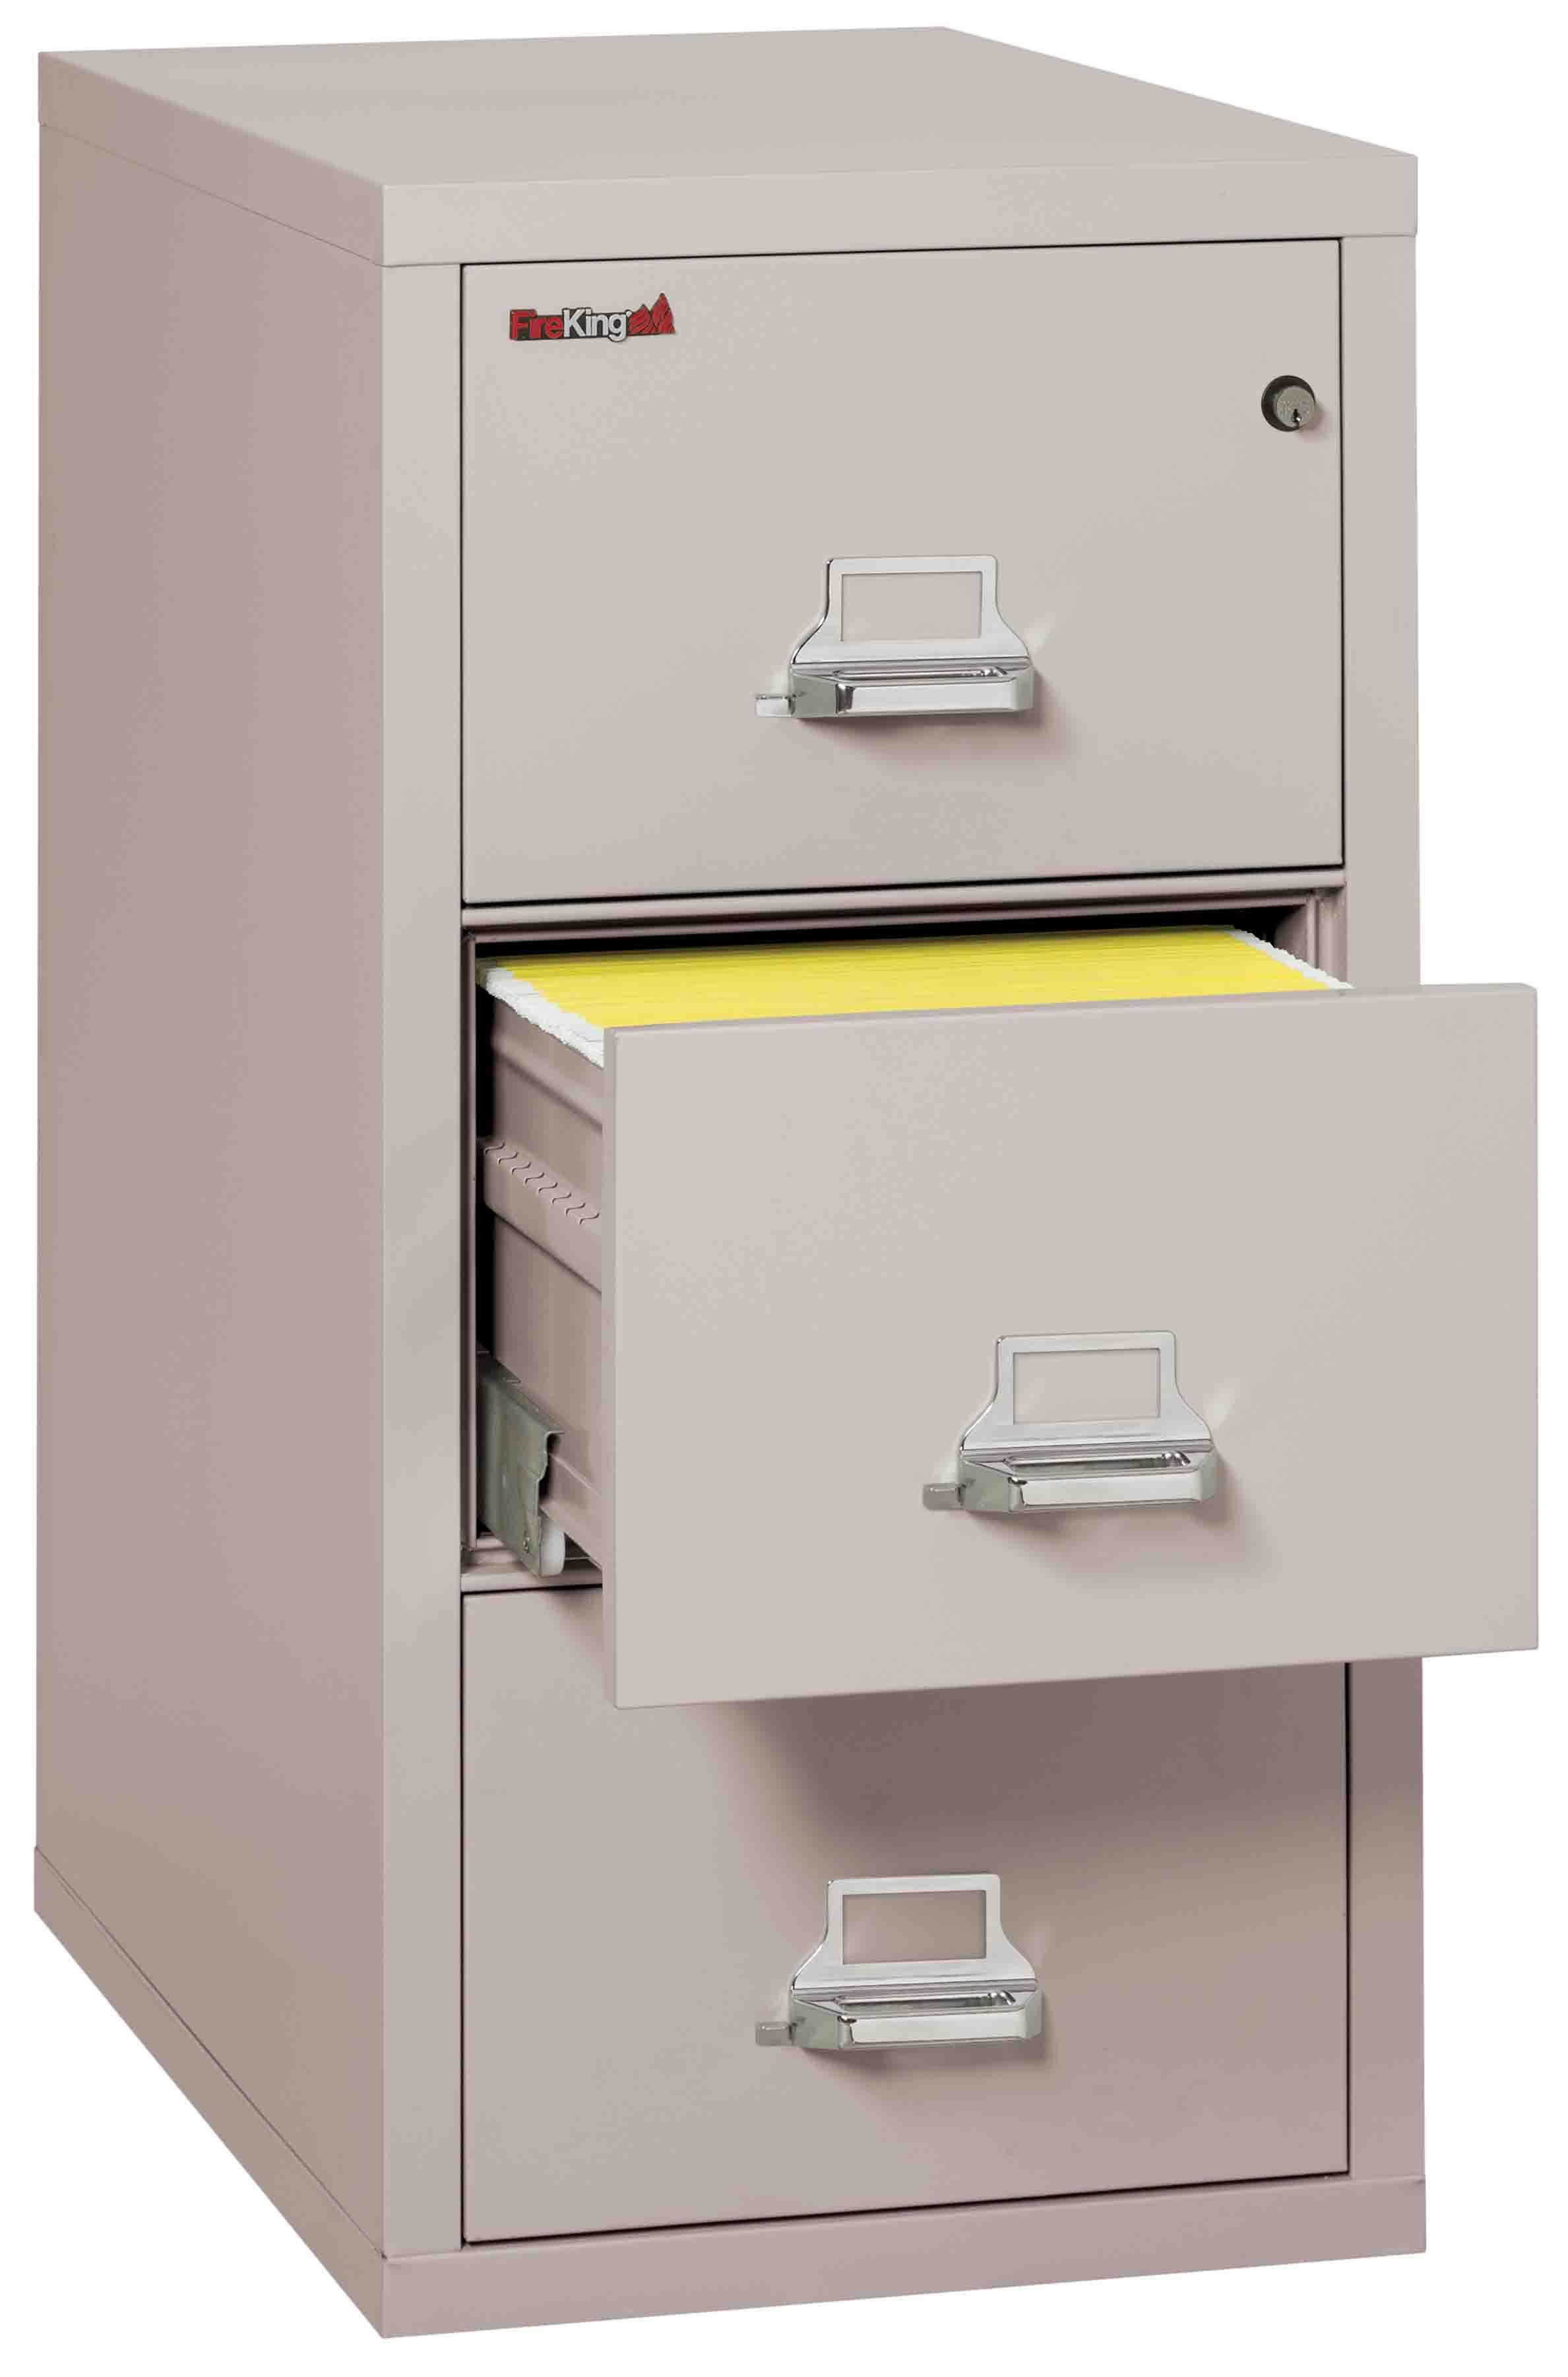 Fire King Fireproof File Cabinet Cabinets Matttroy